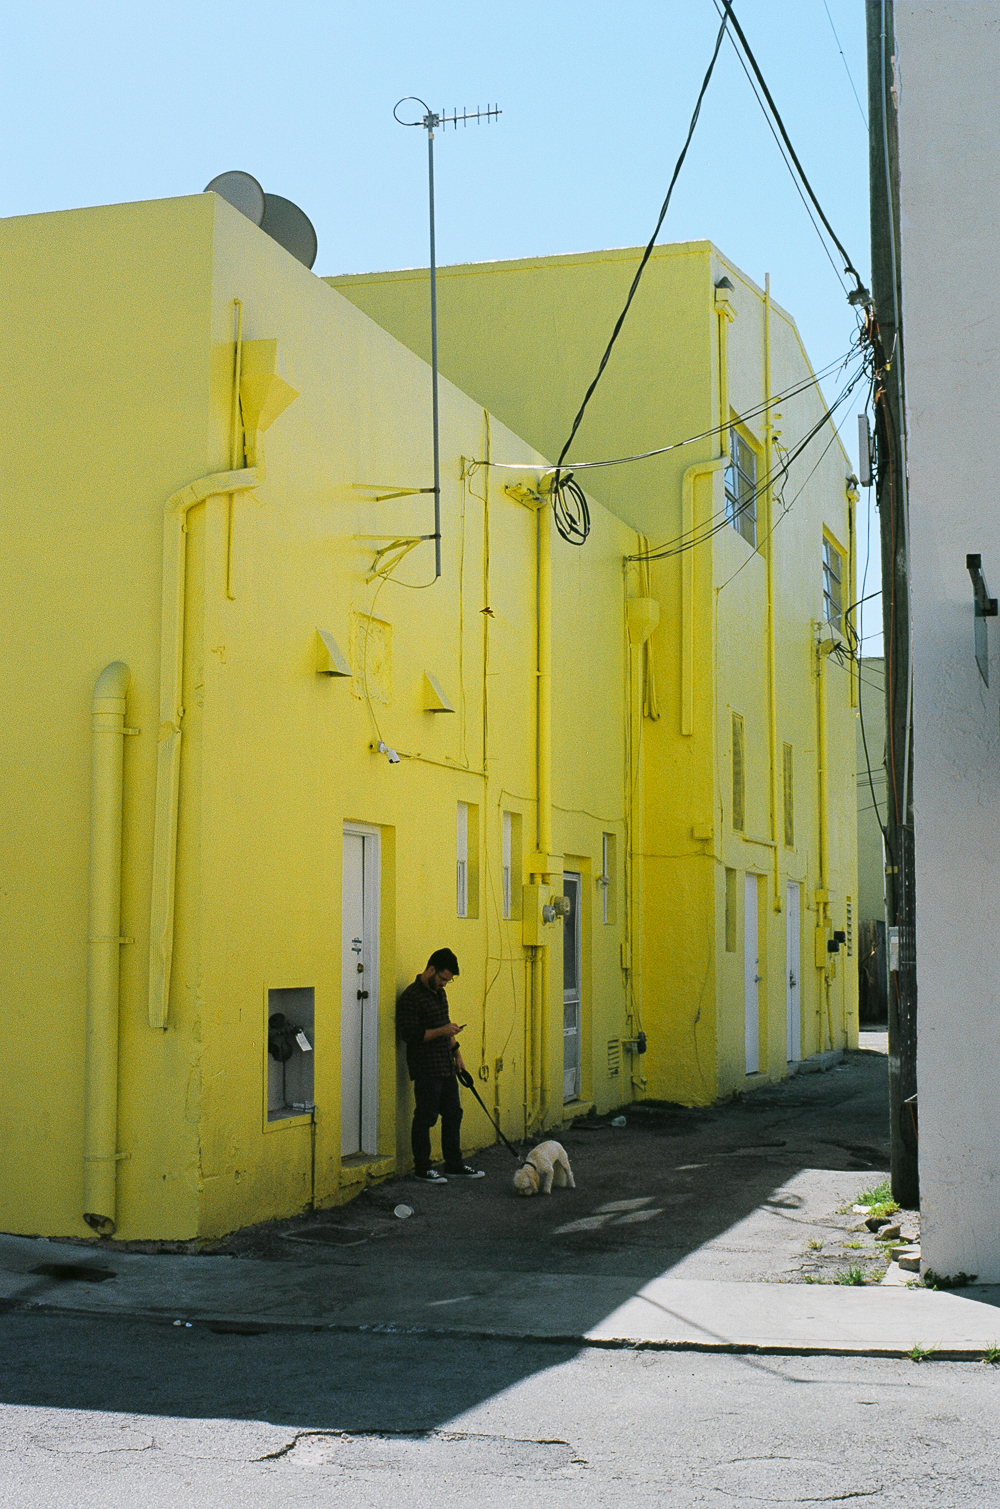 Maisons jaunes